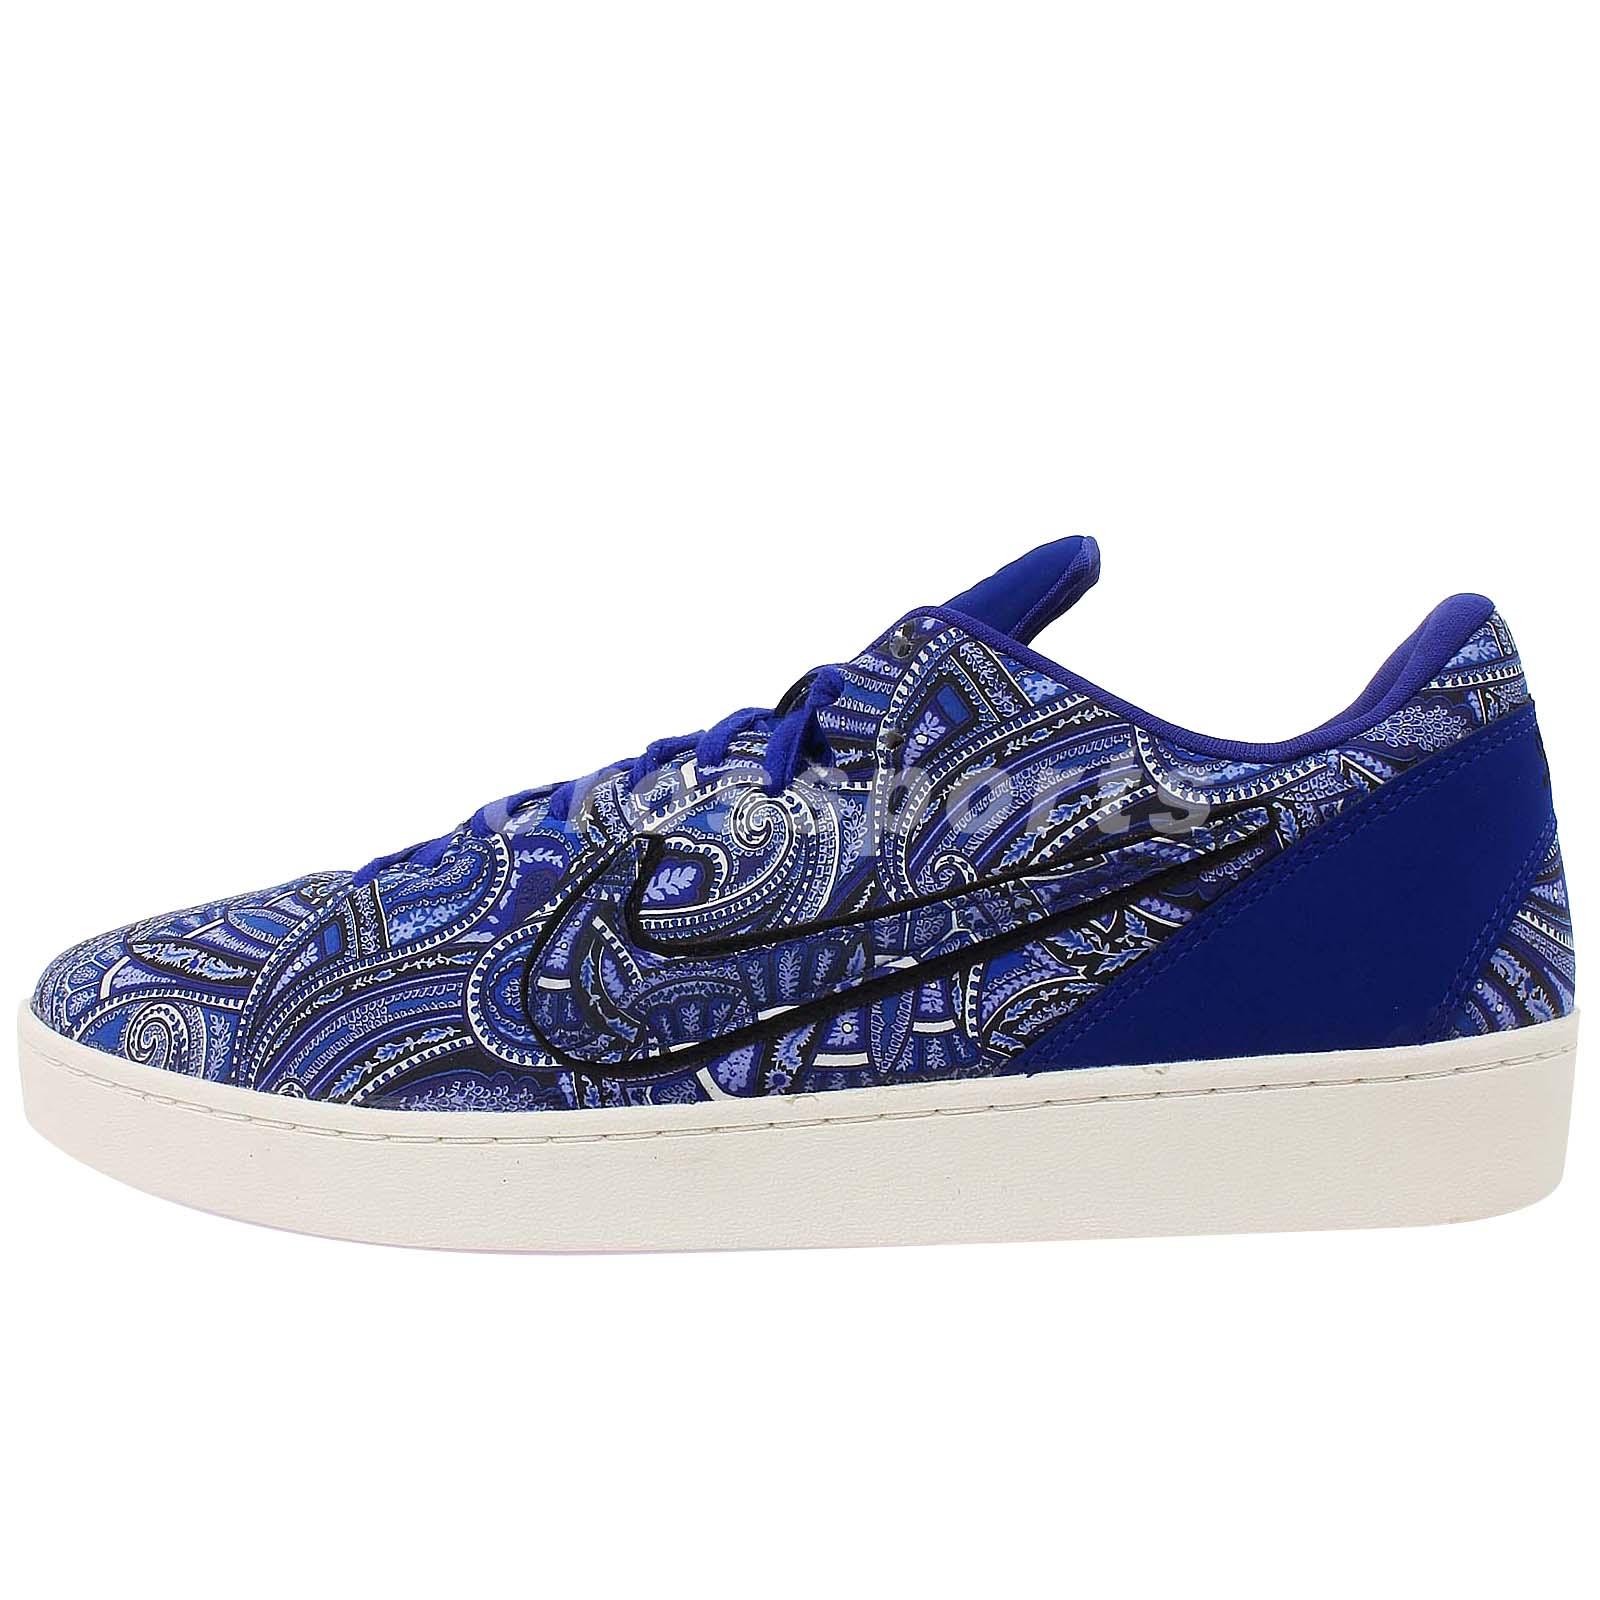 Nike Kobe 8 / 9 NSW Lifestyle Bryant Mens Casual Shoes